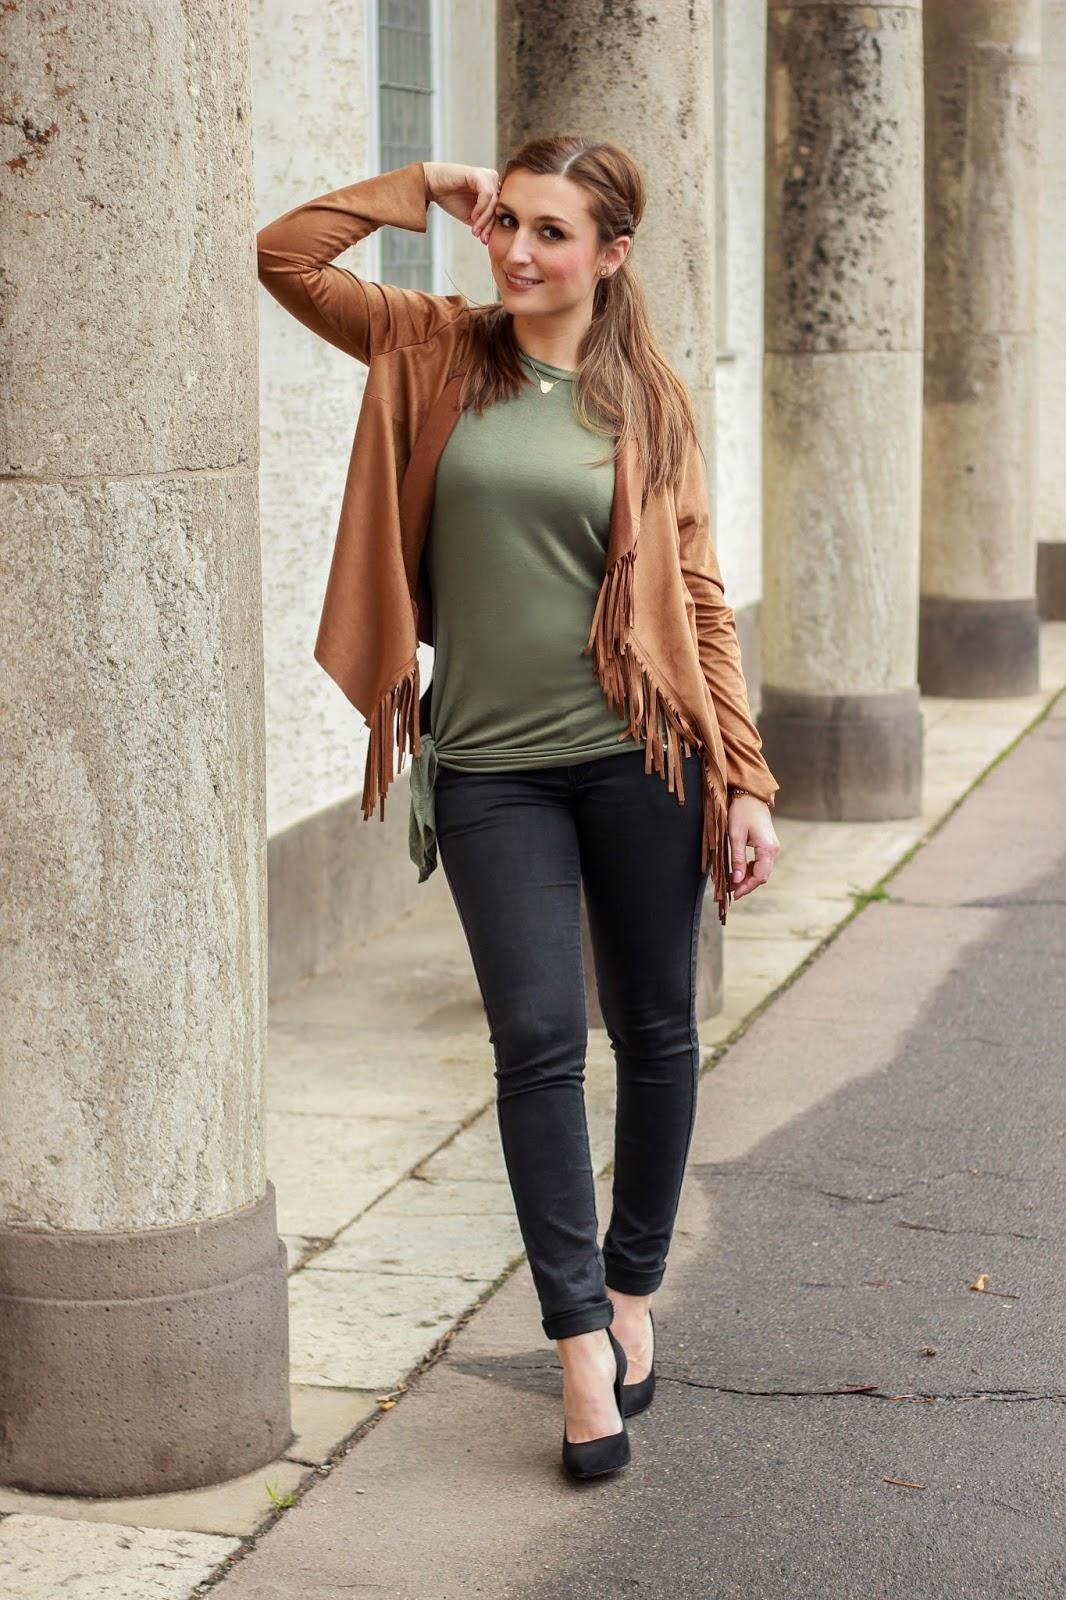 fashionstylebyjohanna Fashionblogger aus Frankfurt - frankfurt Fashionblogger - german fashionblogger